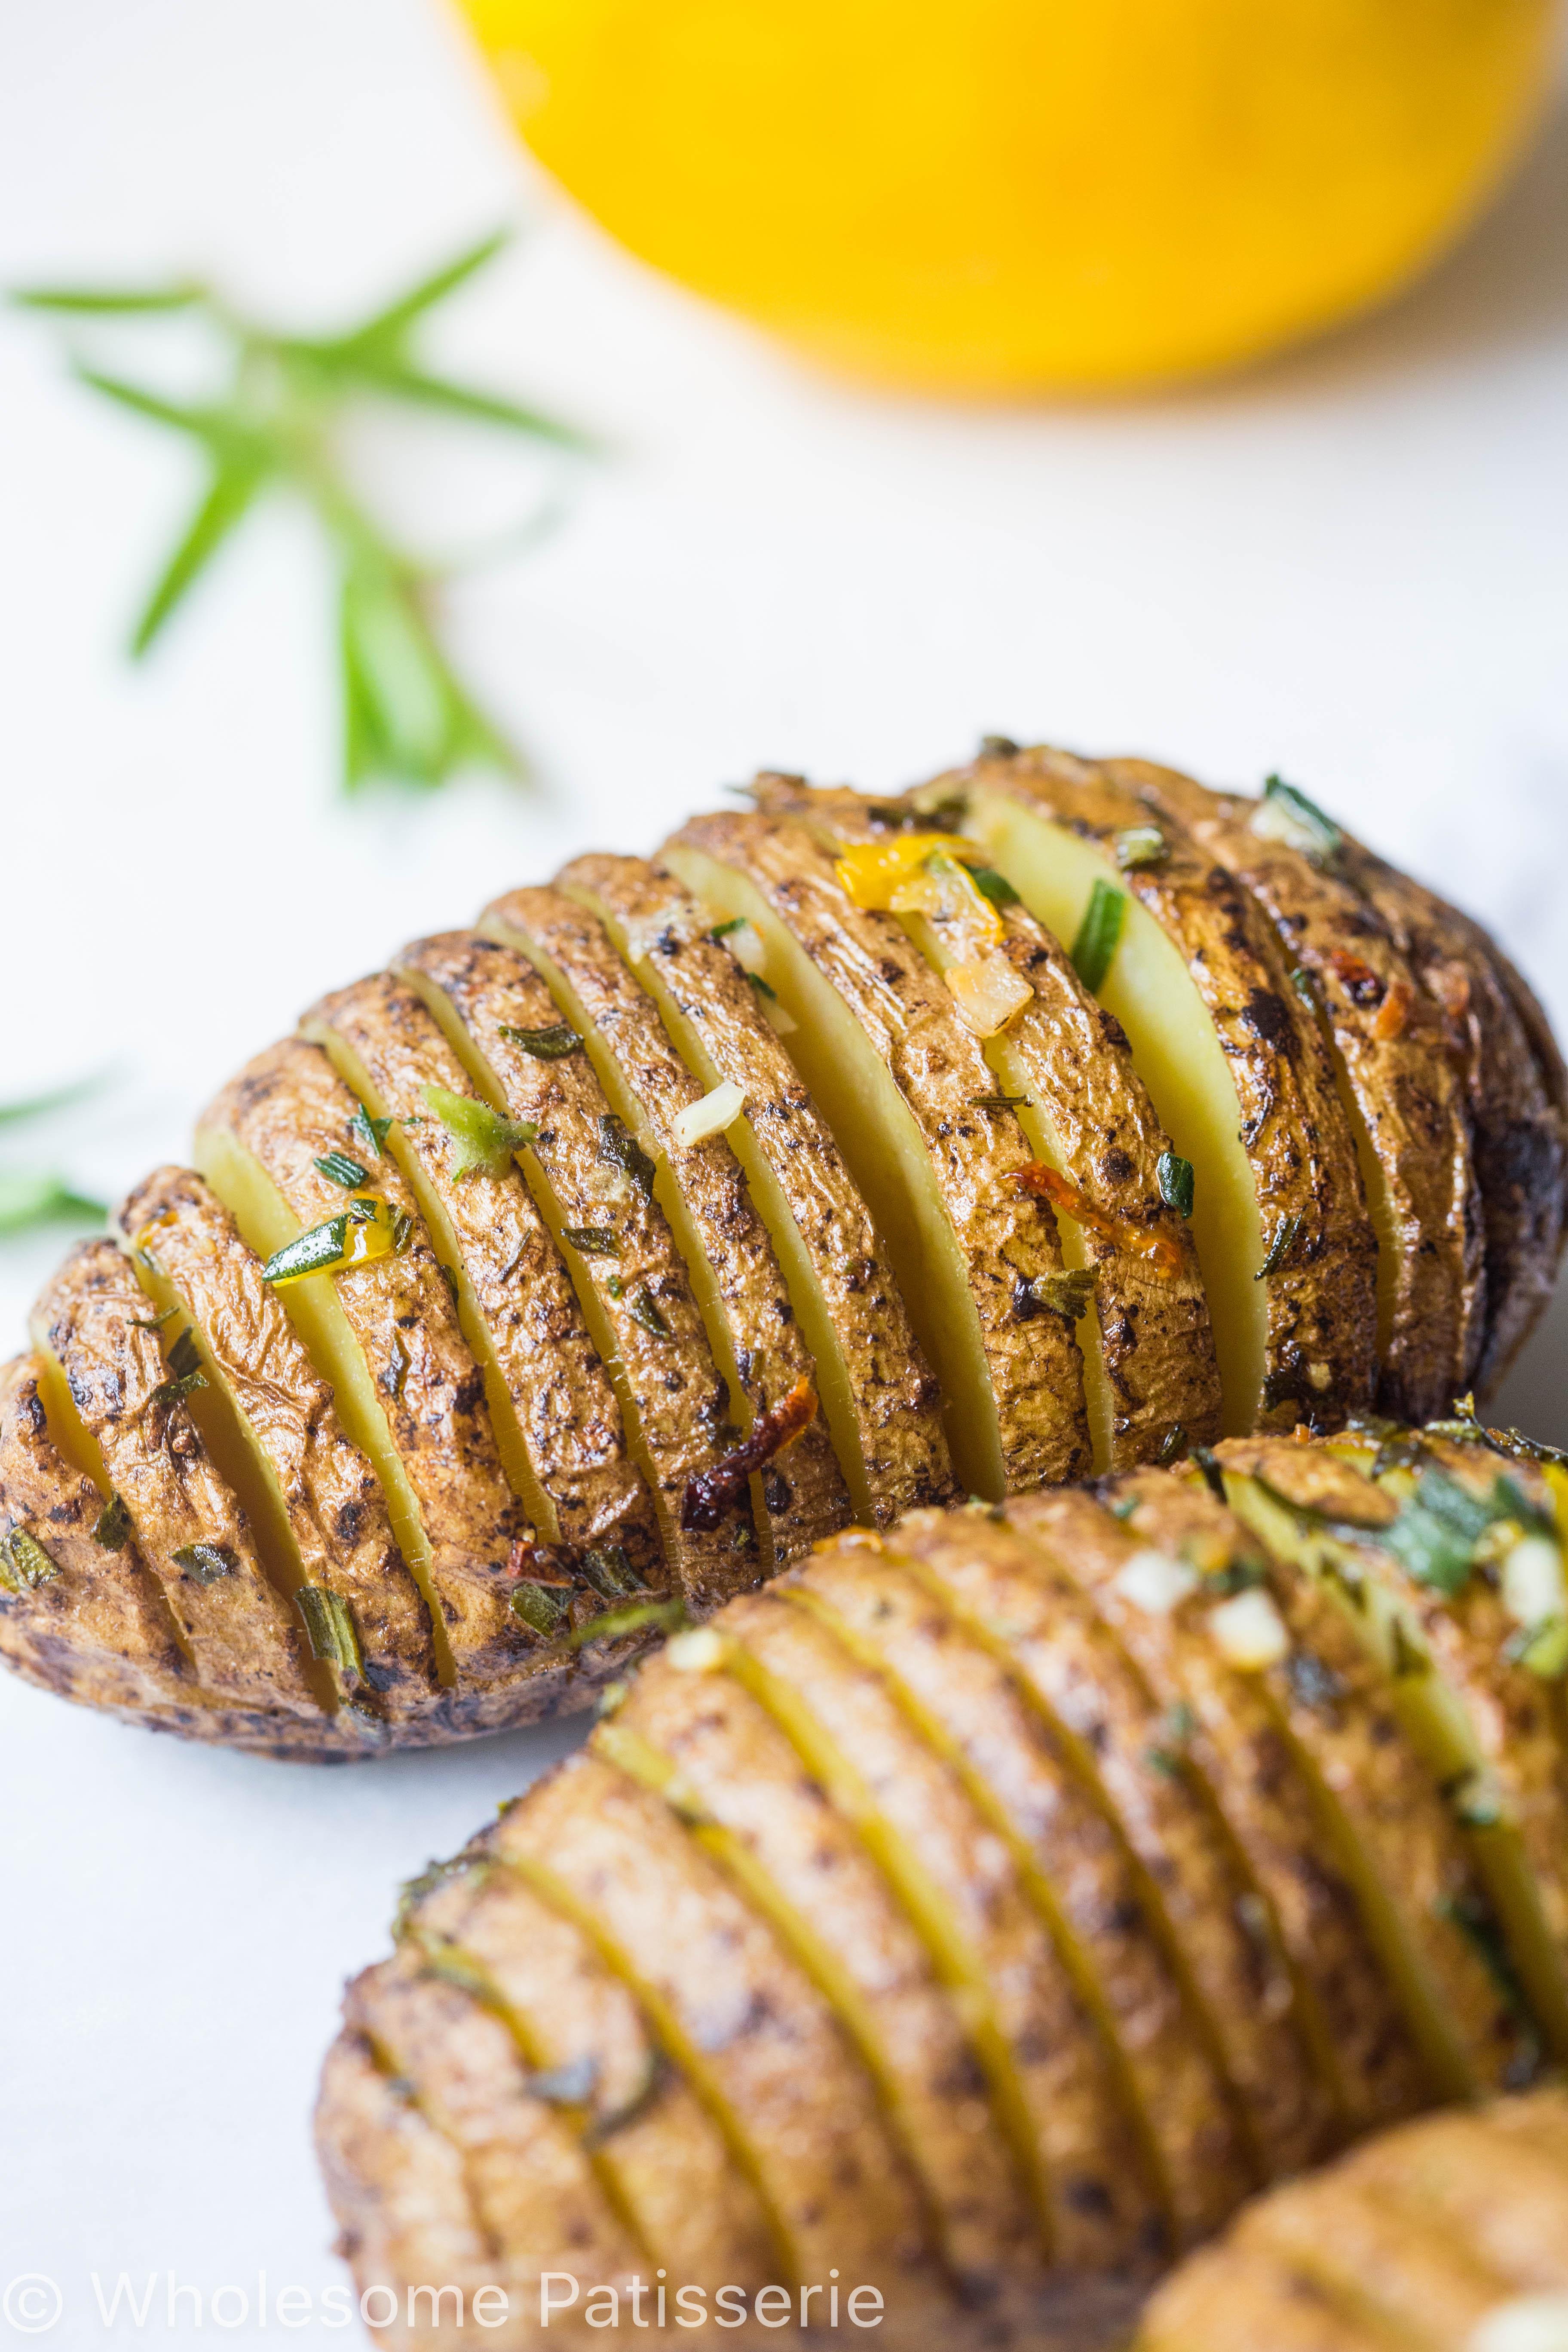 hasselback-potatoes-crispy-delicious-golden-easy-dinner-vegan-roast-potatoes-simple